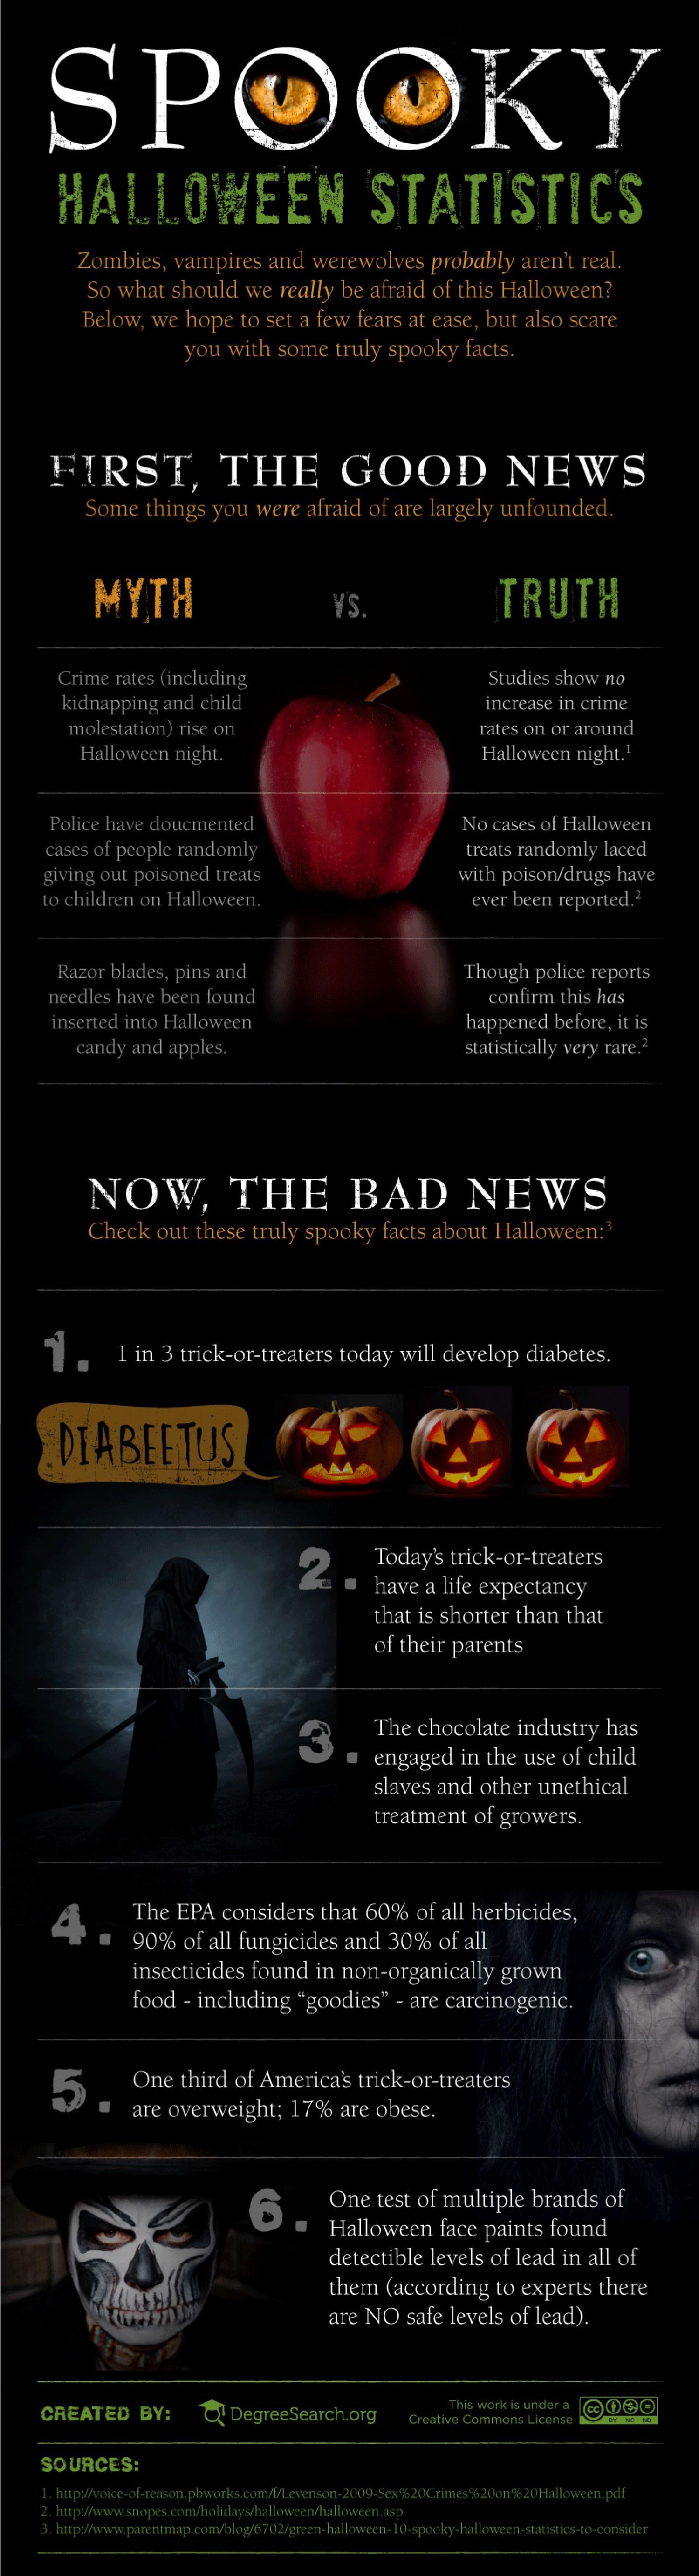 Spooky Halloween Statistics